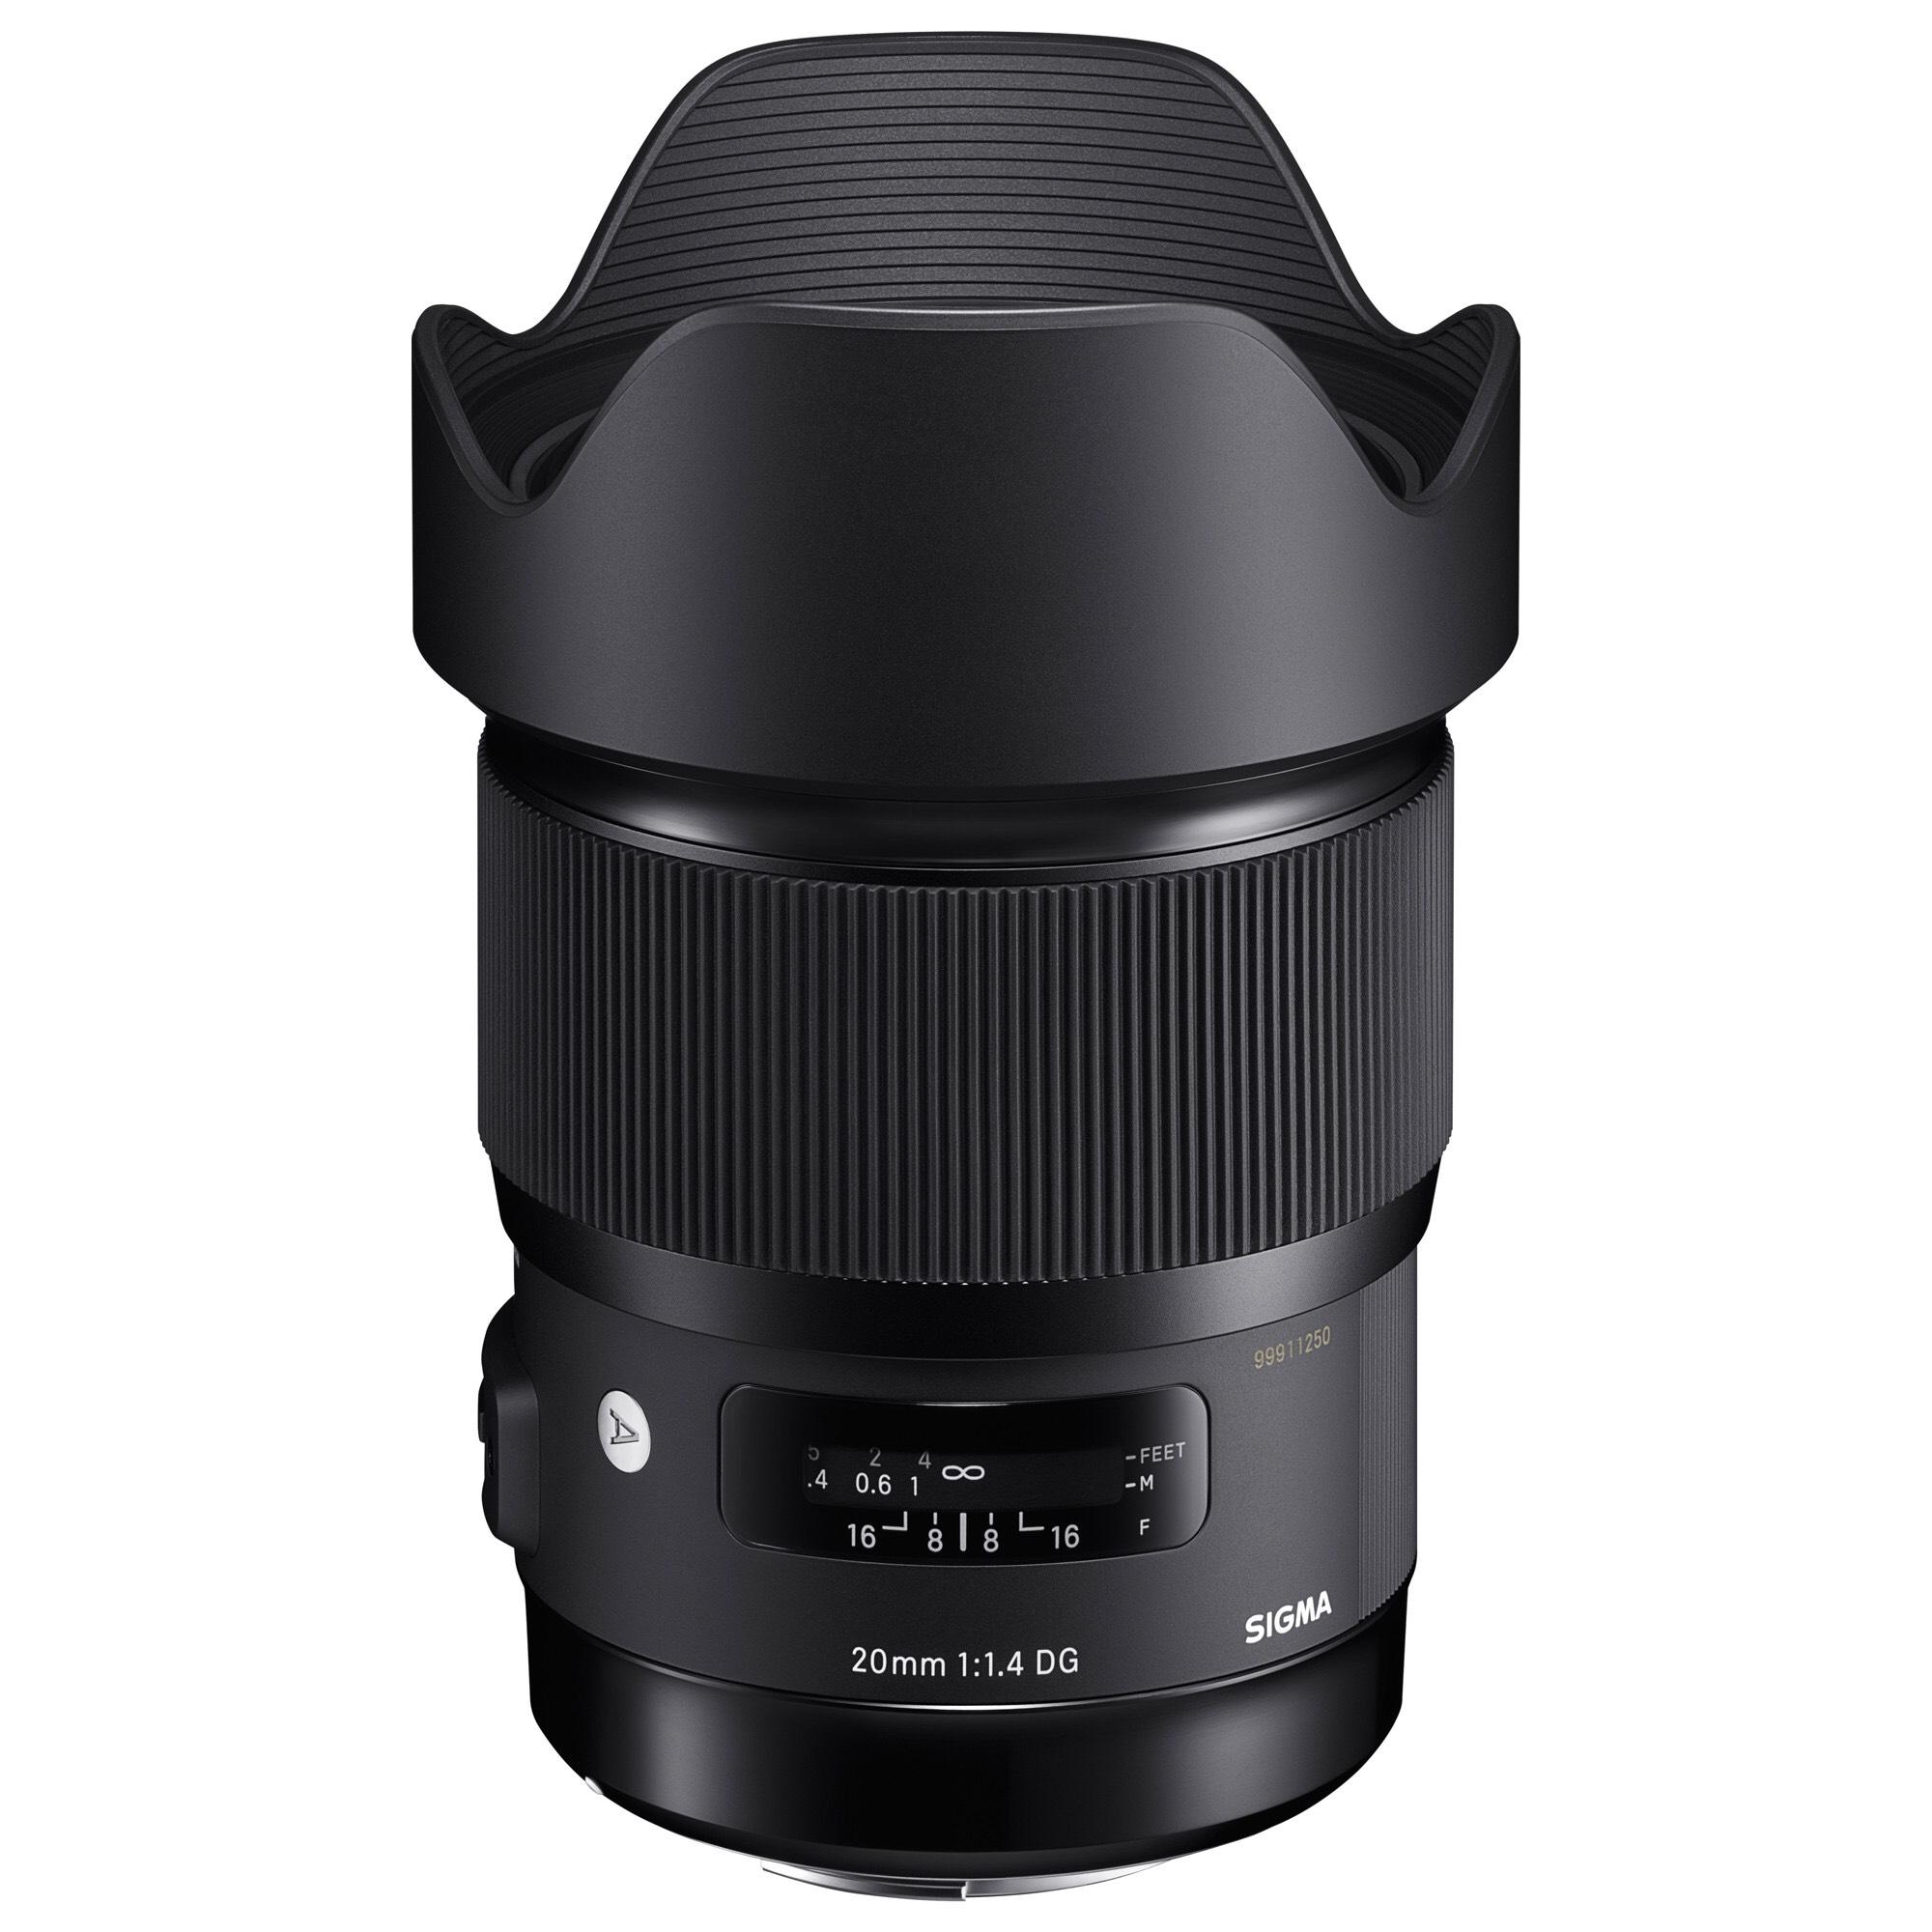 [amazon.it] Sigma 20mm F1,4 DG HSM Art Objektiv für Canon